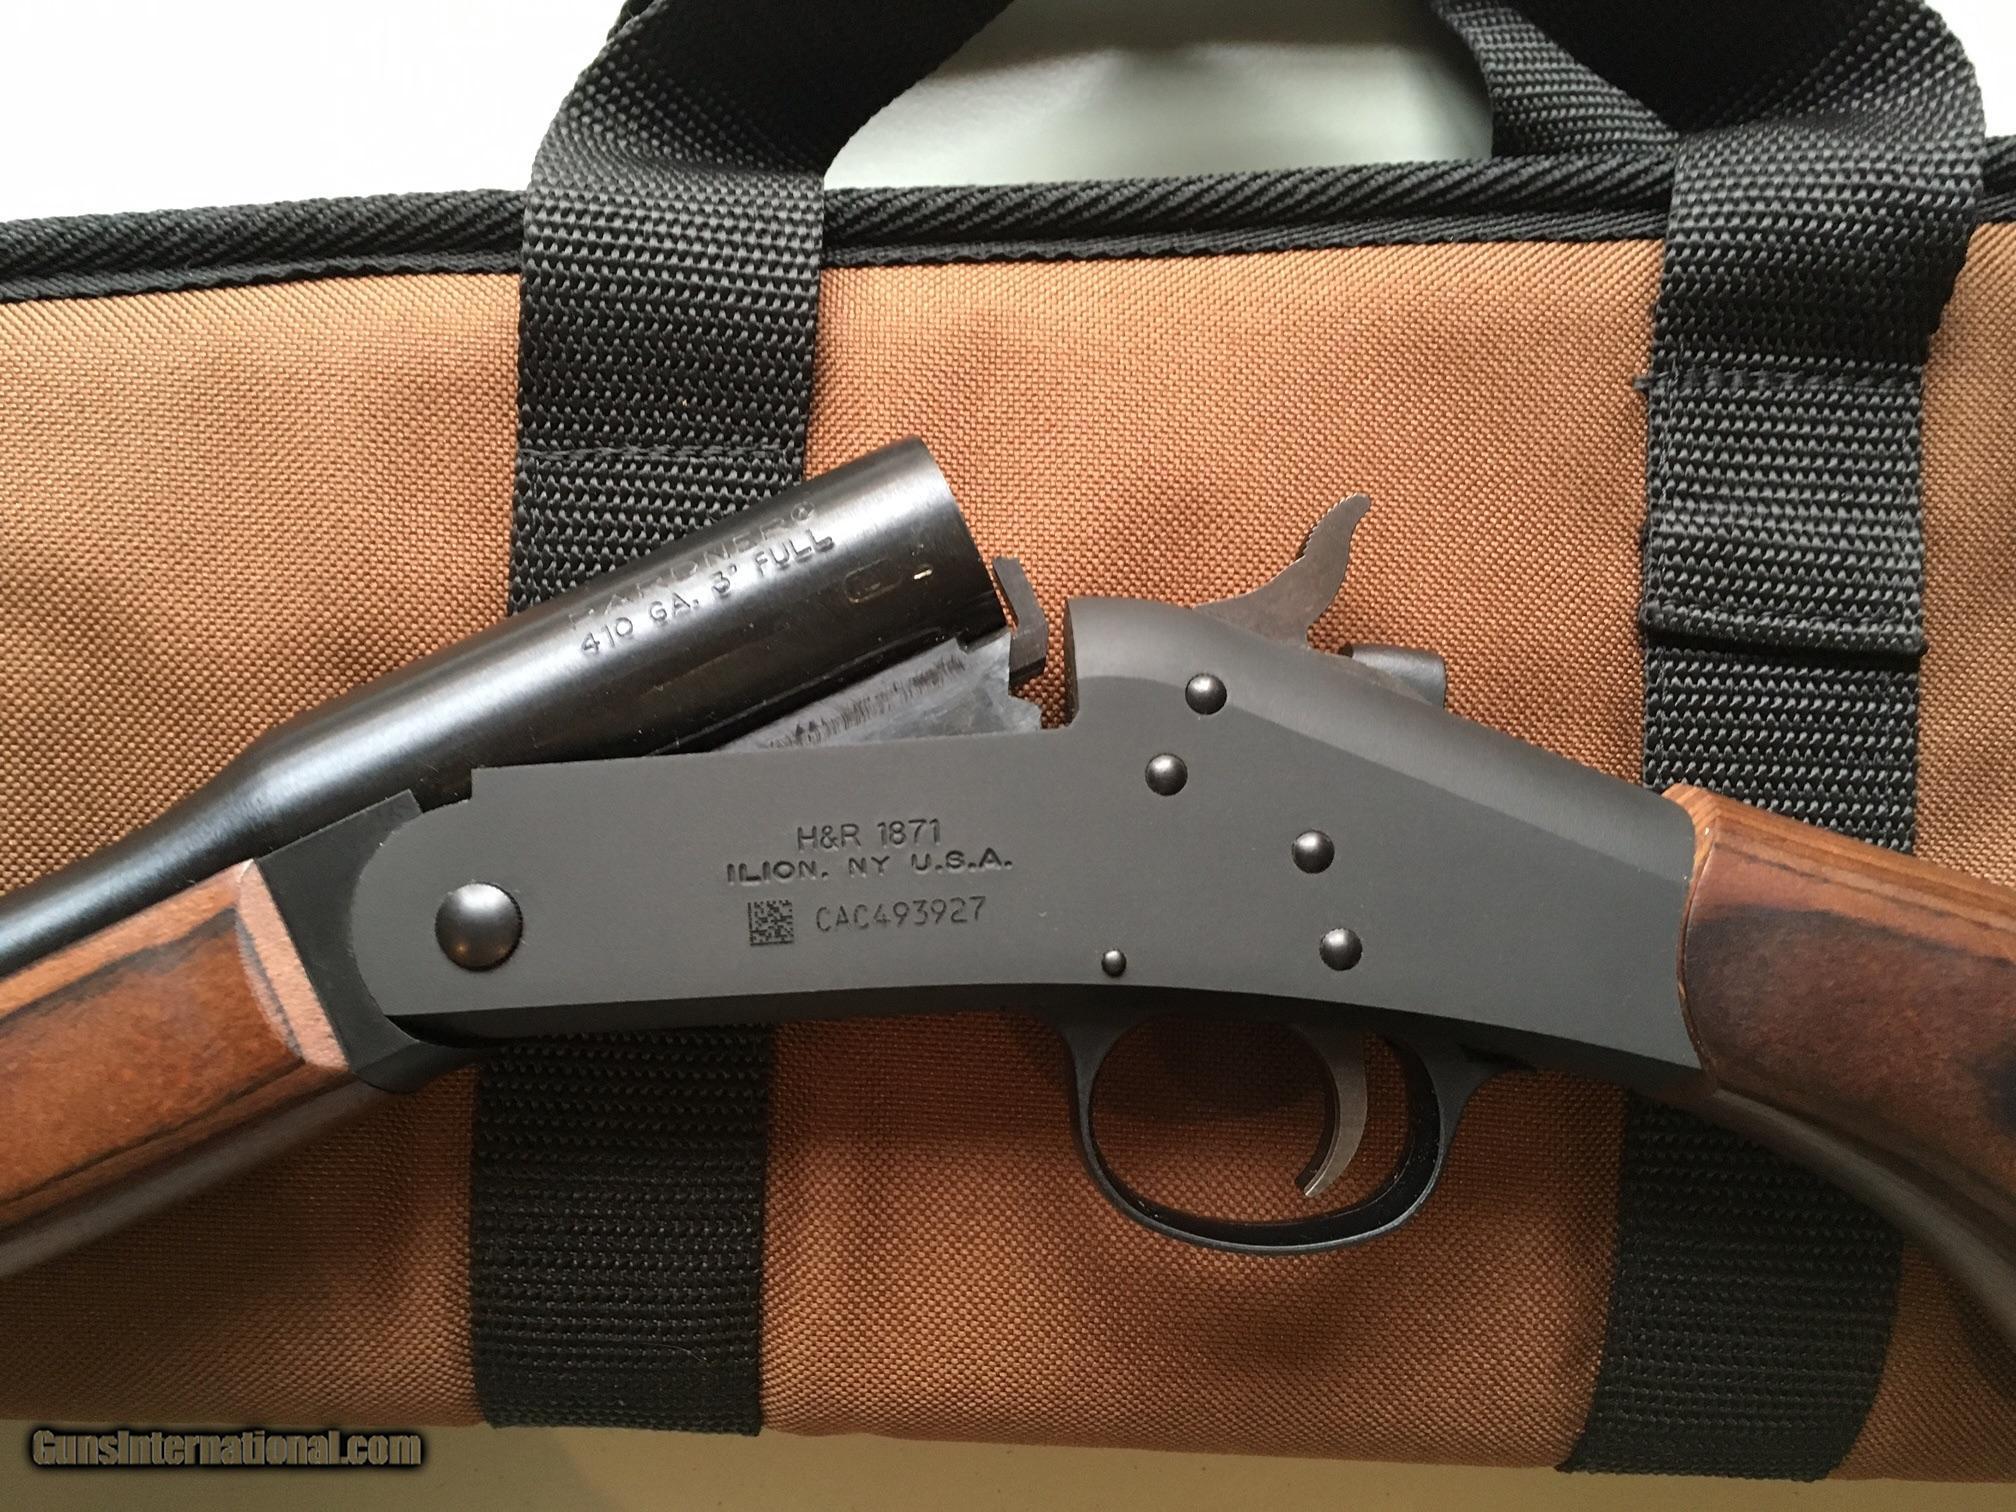 Harrington & Richardson Pardner Compact .410 gauge Single ...  Harrington & Ri...